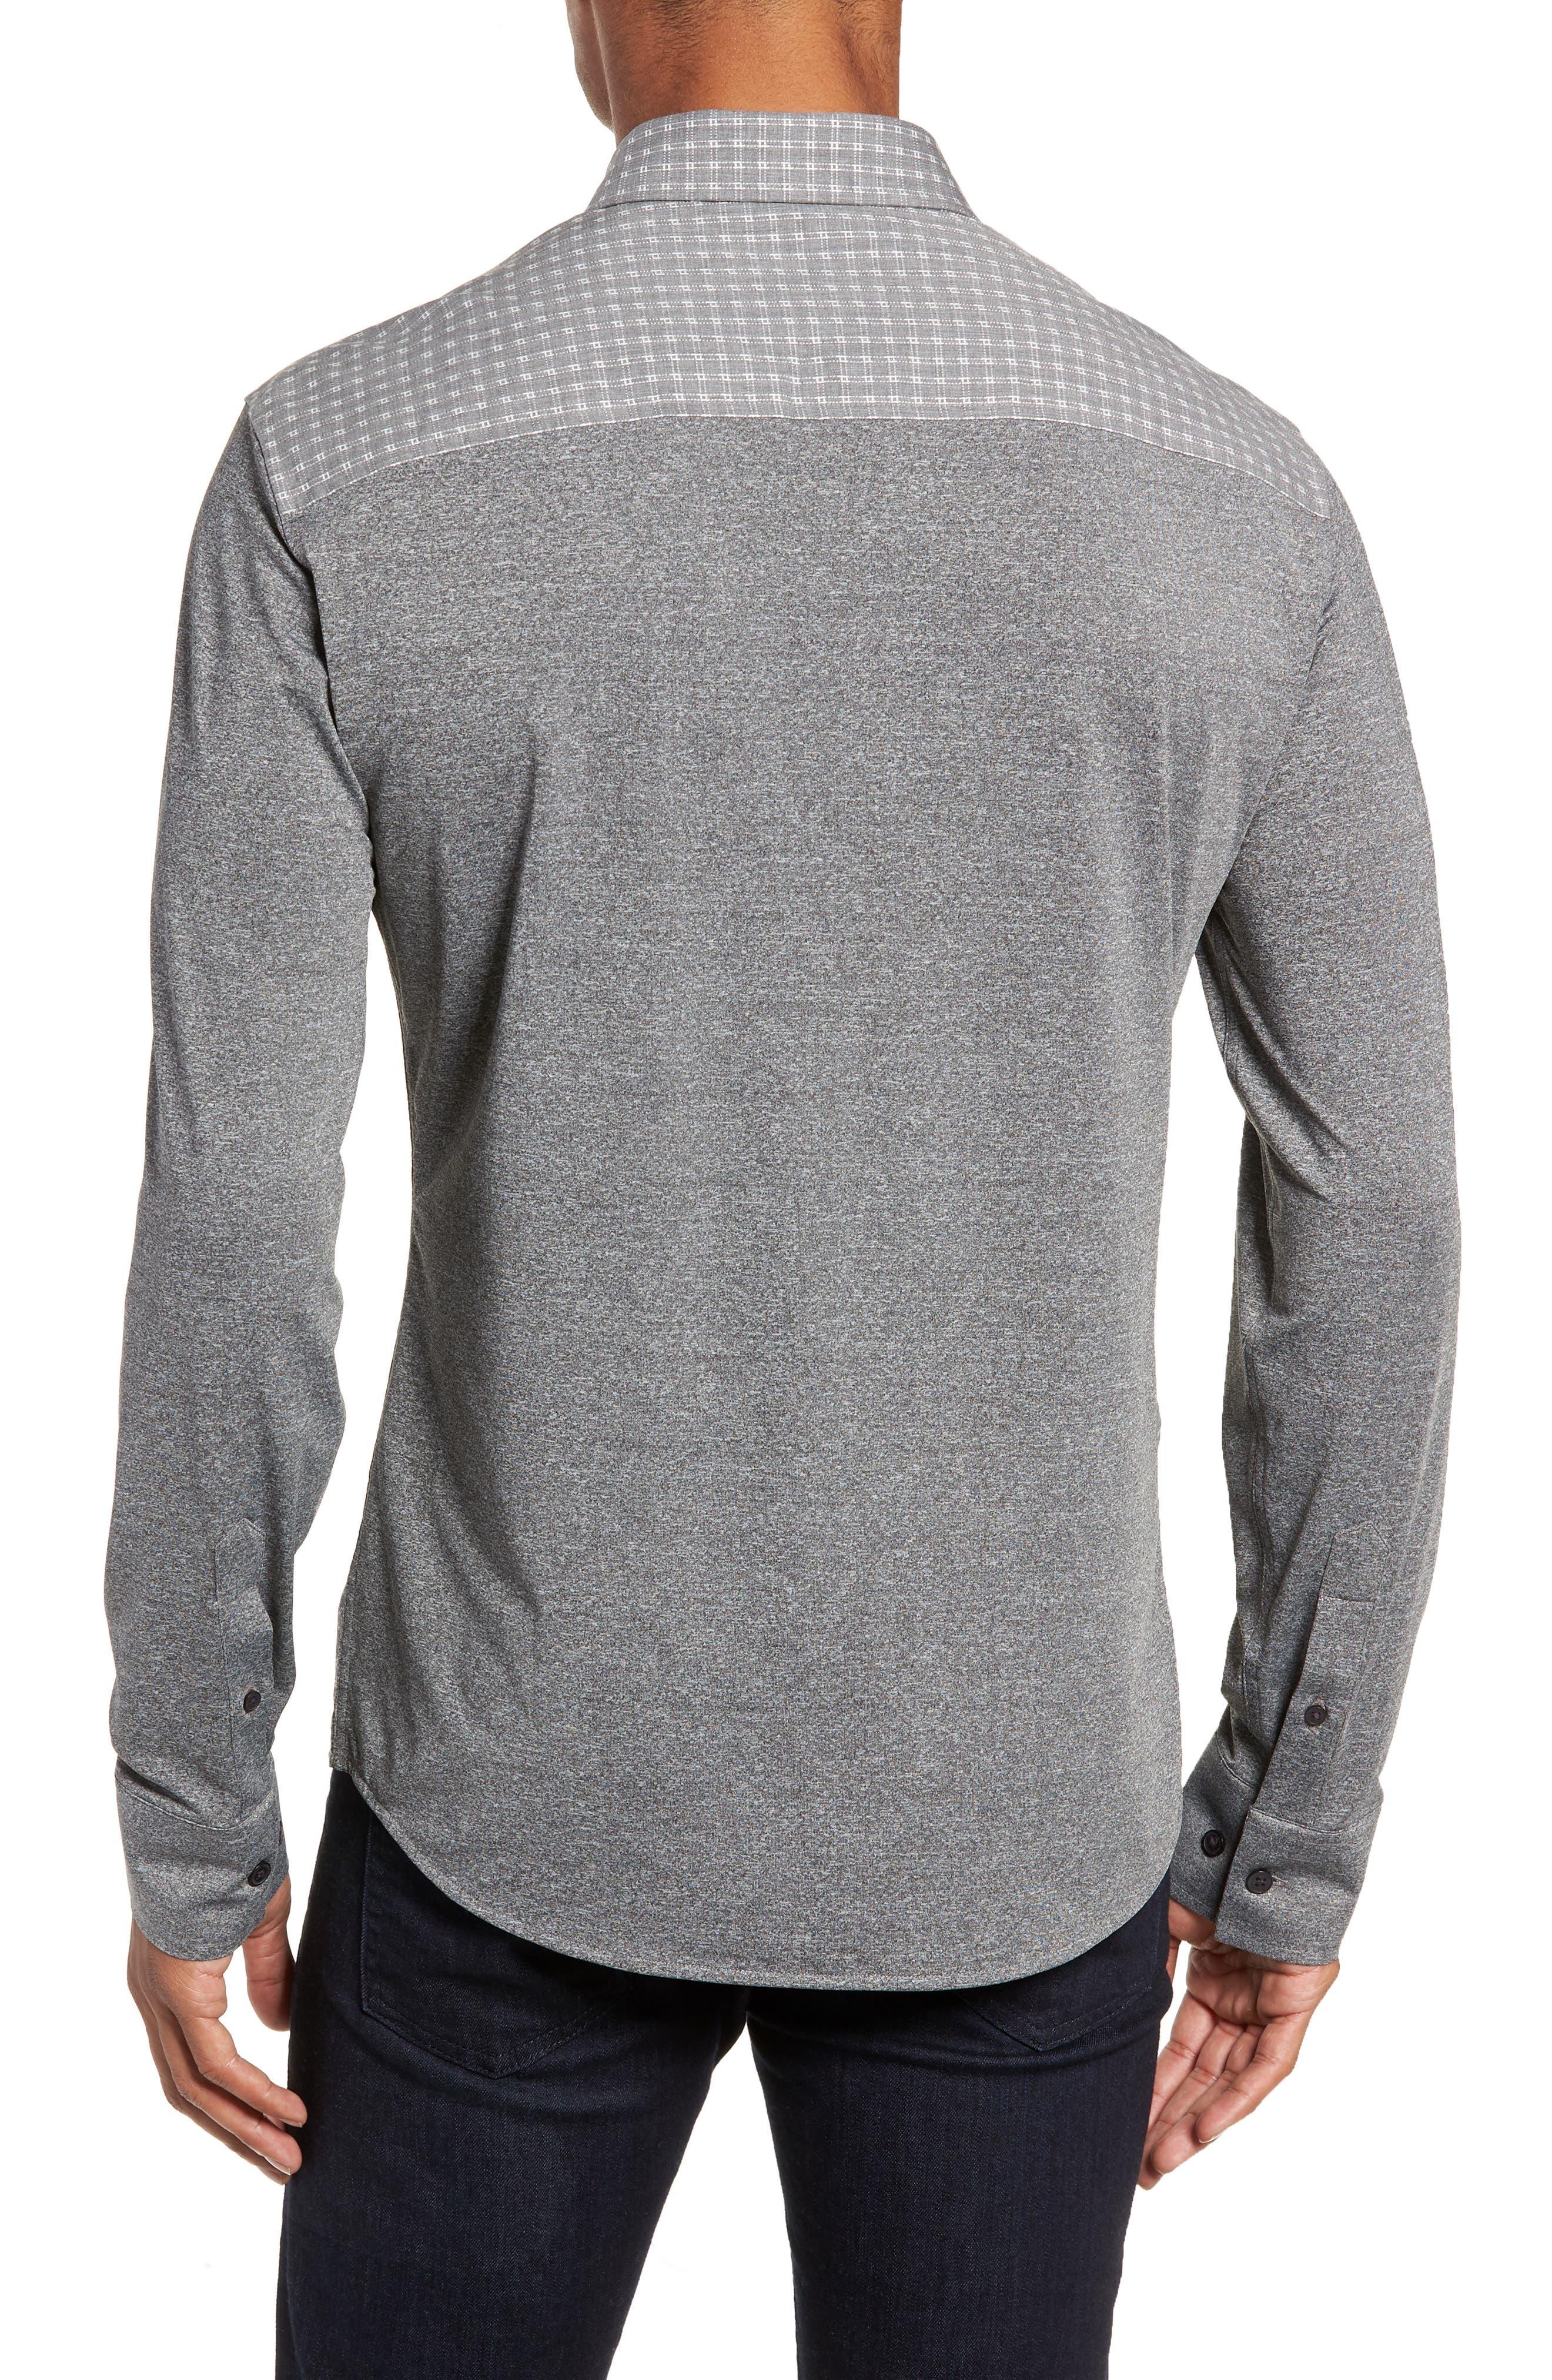 VINCE CAMUTO,                             Slim Fit Mixed Media Sport Shirt,                             Alternate thumbnail 3, color,                             034